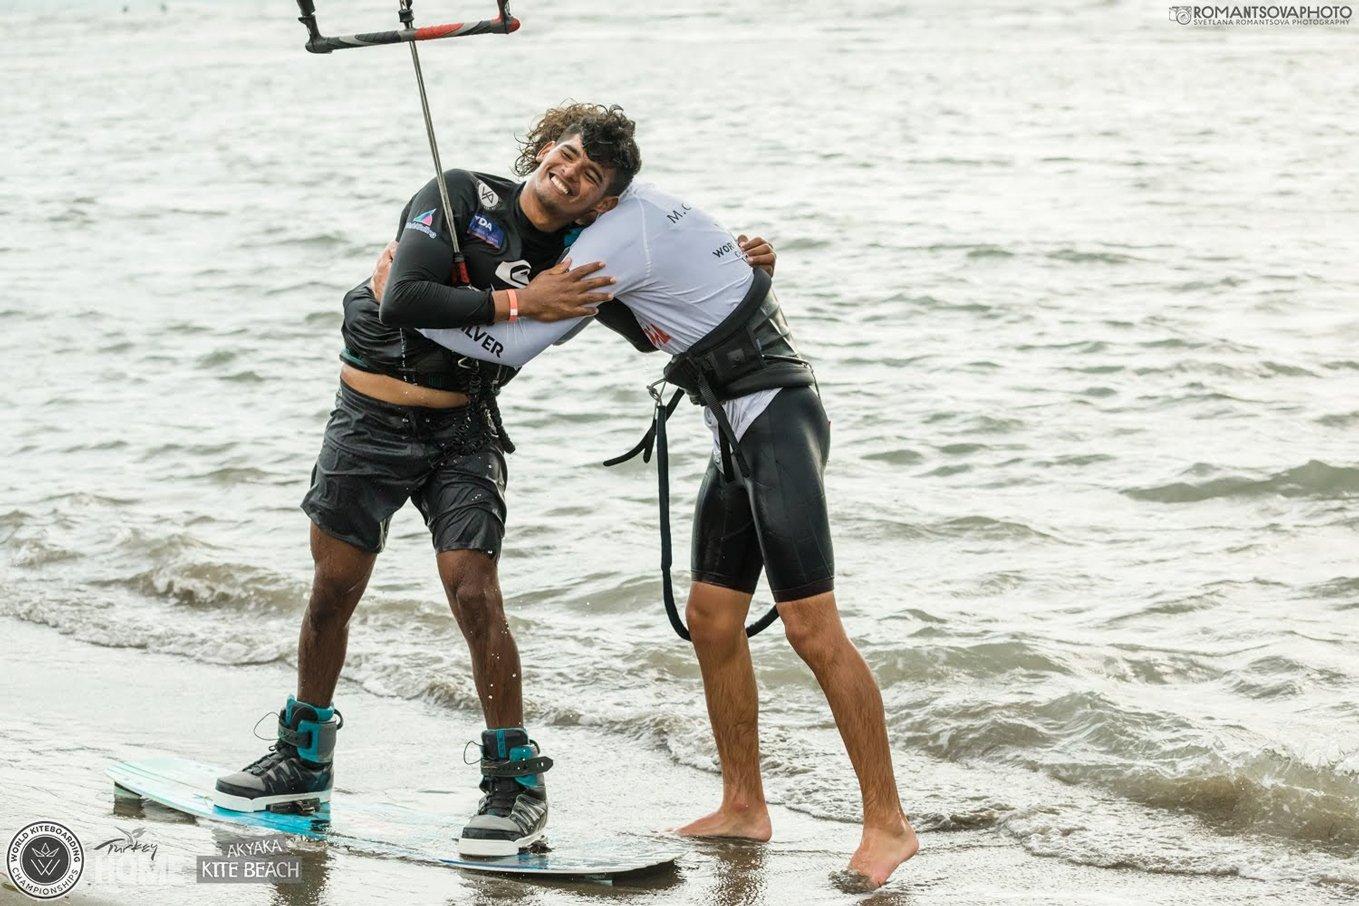 Competition kitesurf-Carlos Mario-chabloz